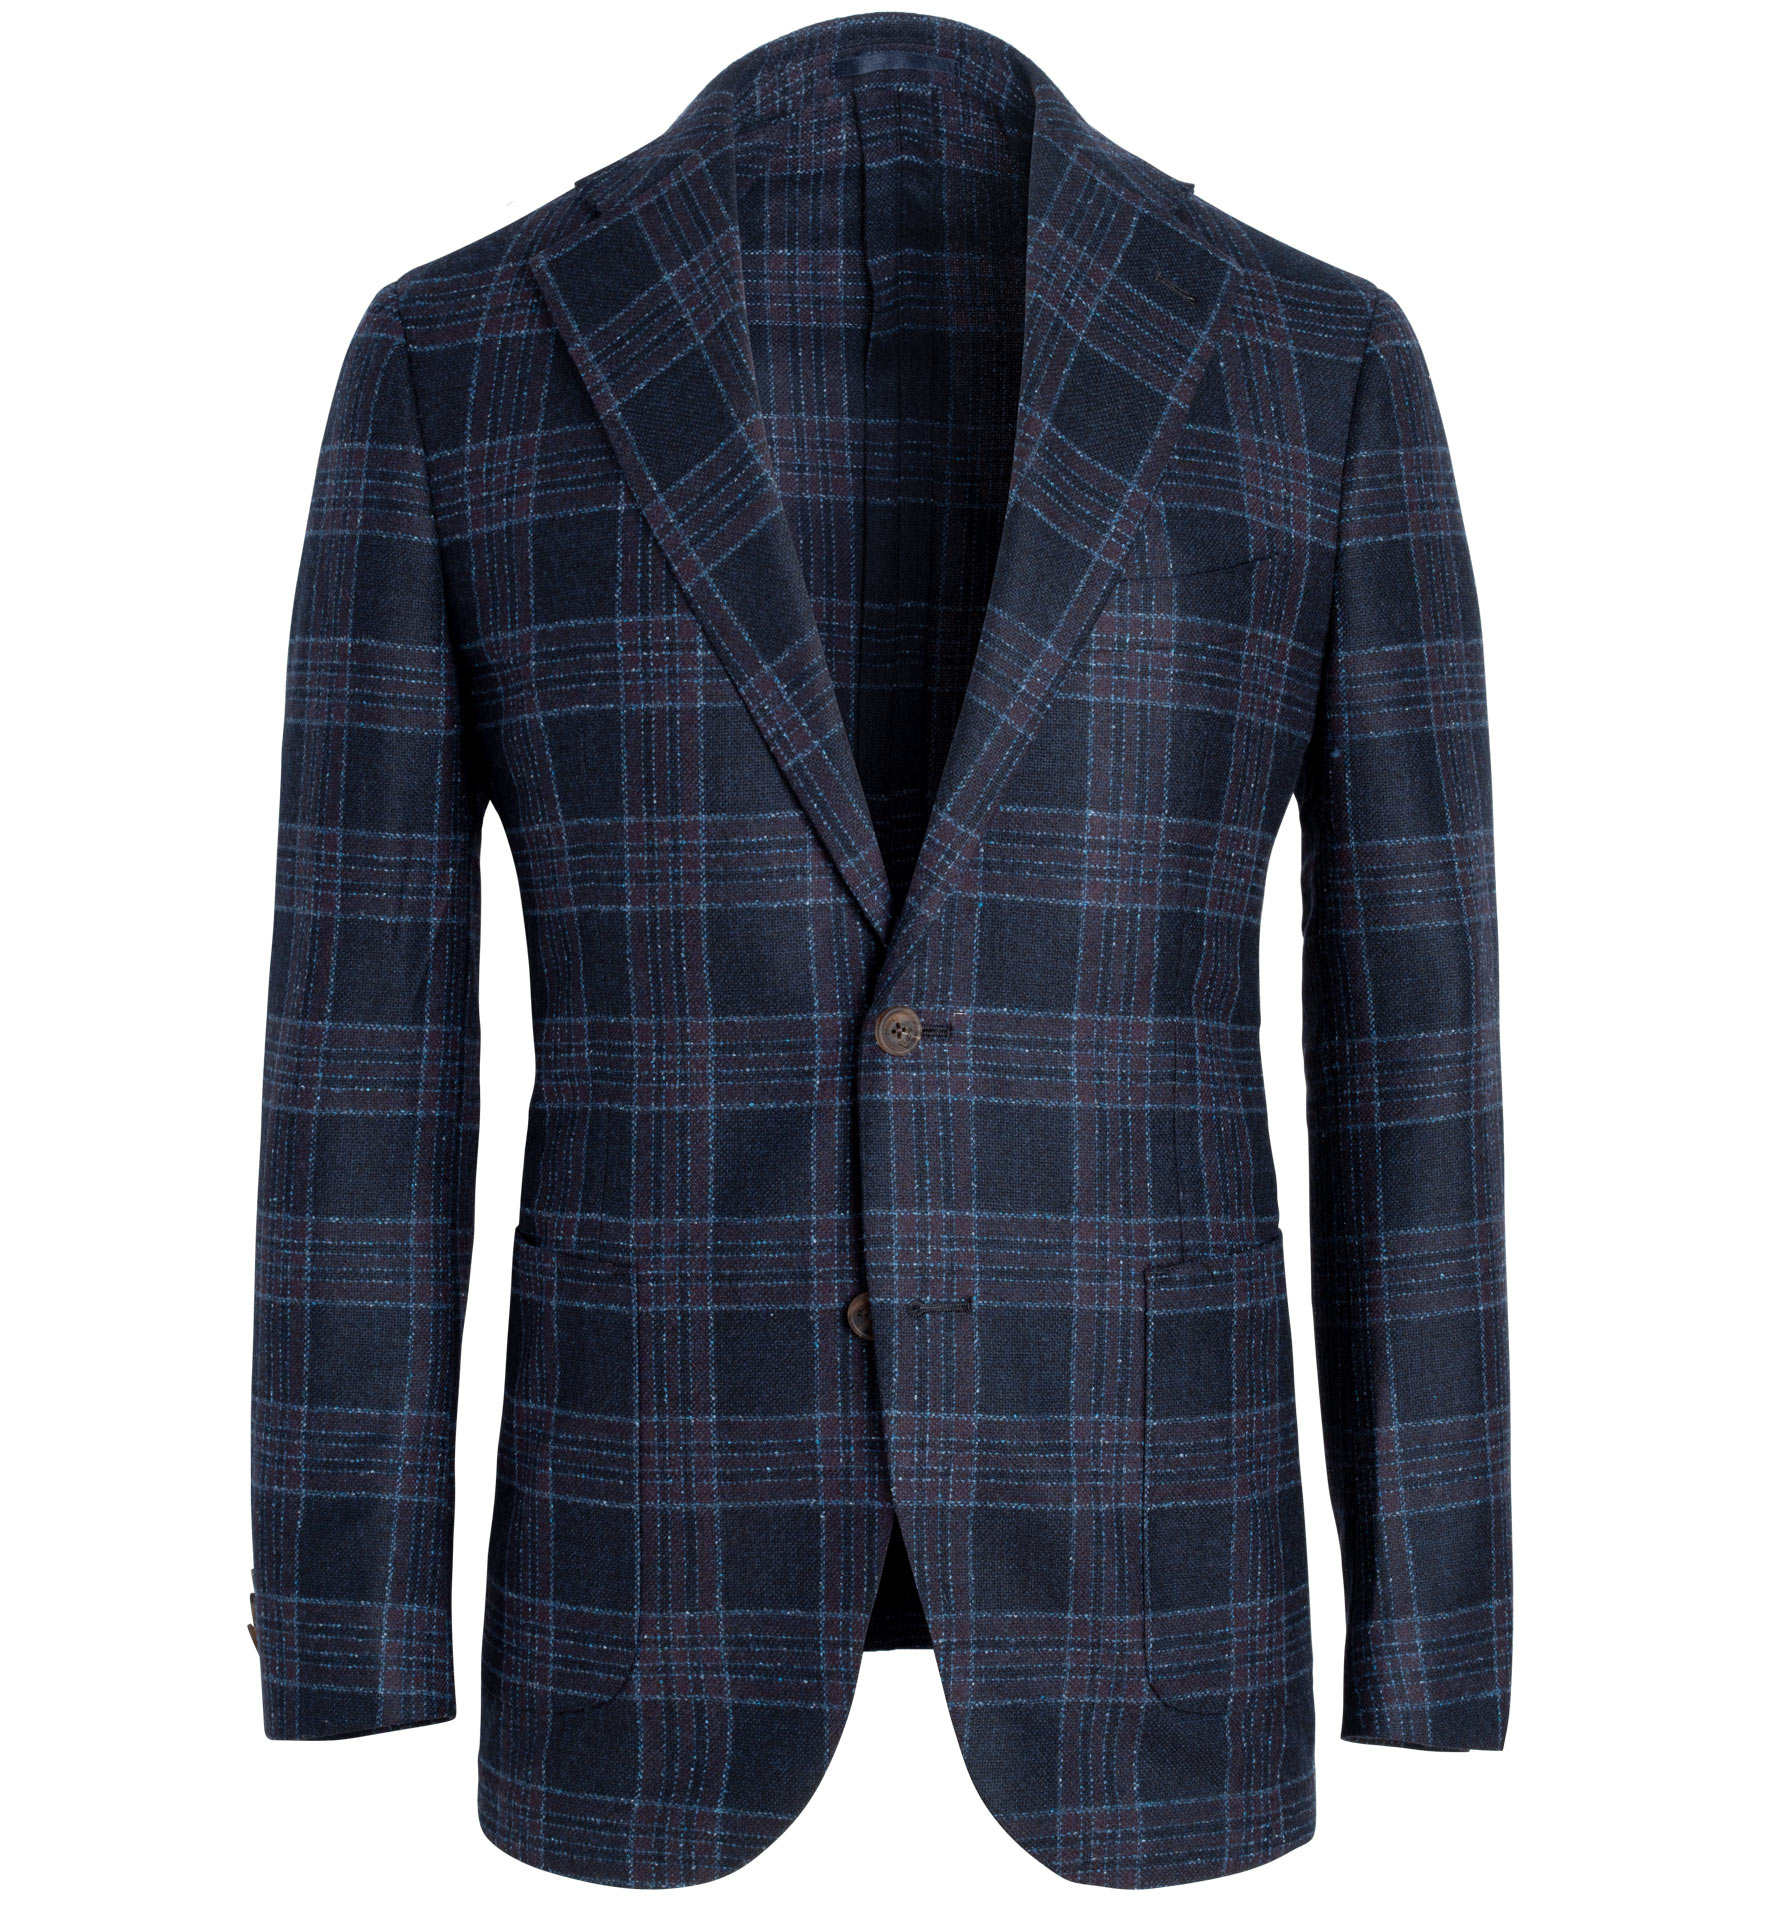 Zoom Image of Bedford Navy Plaid Wool Silk Flannel Jacket